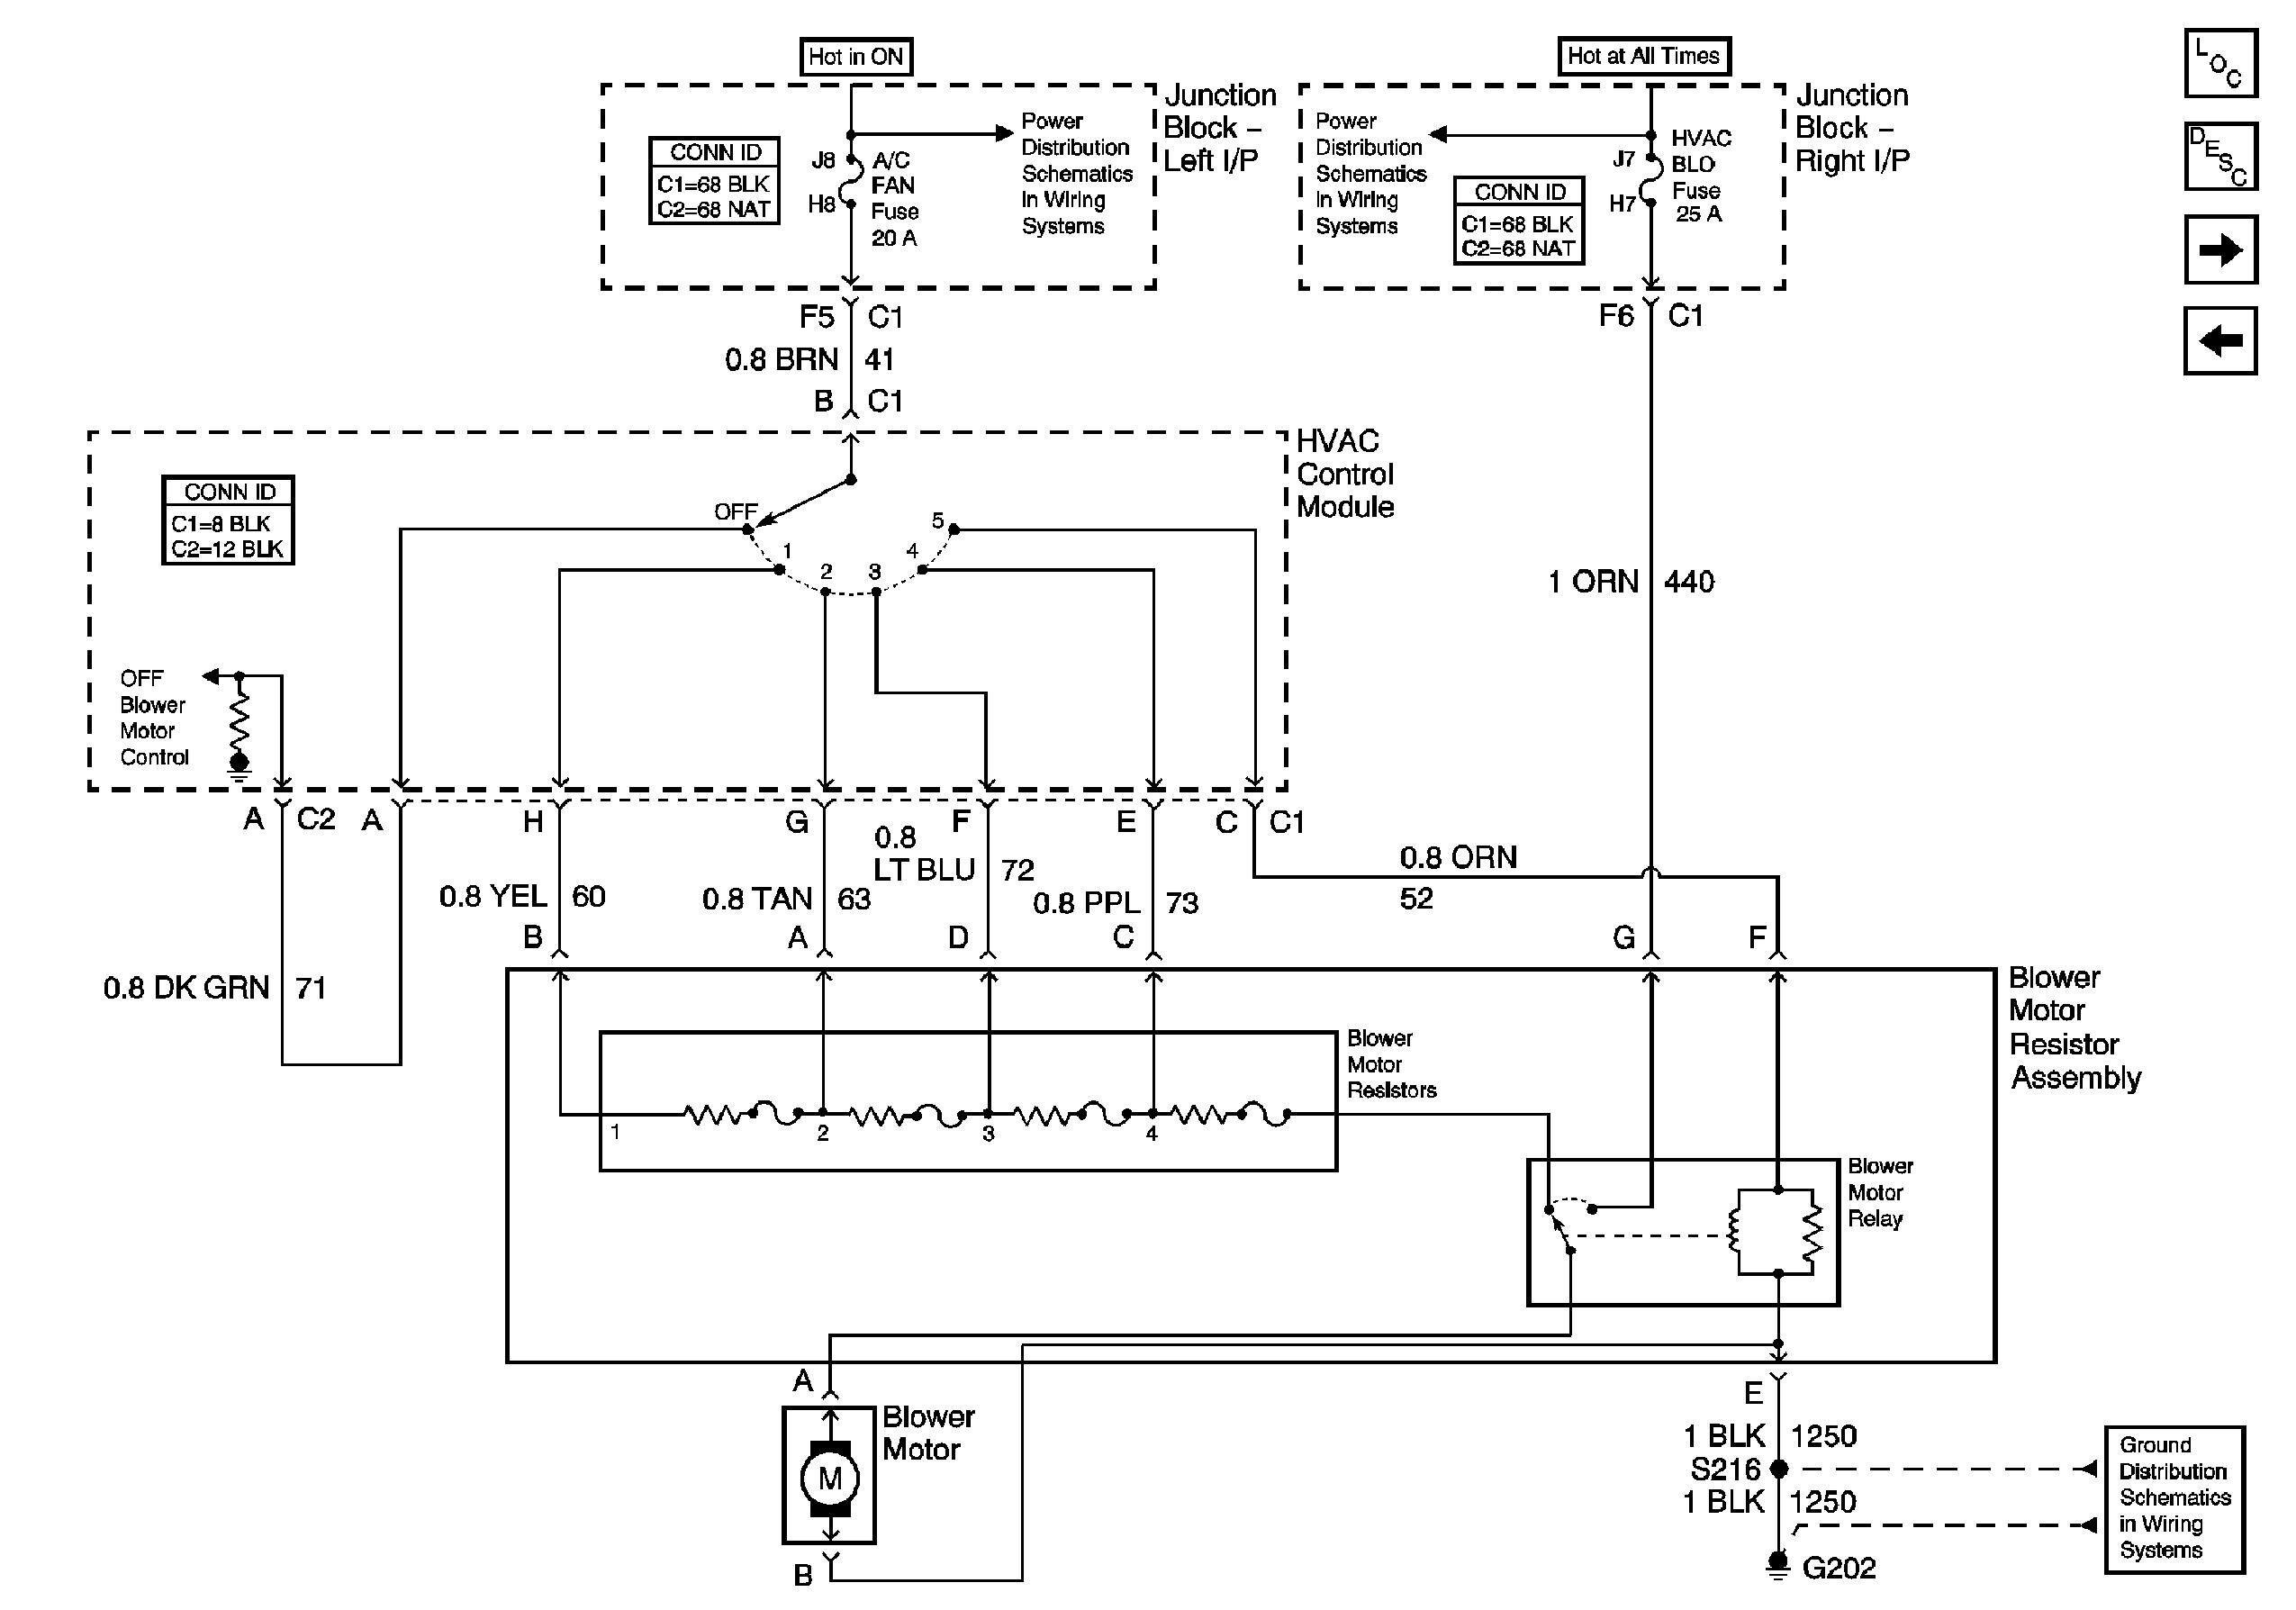 medium resolution of new 2004 dodge ram 1500 ignition wiring diagram diagram04 dodge ram ignition wiring 18